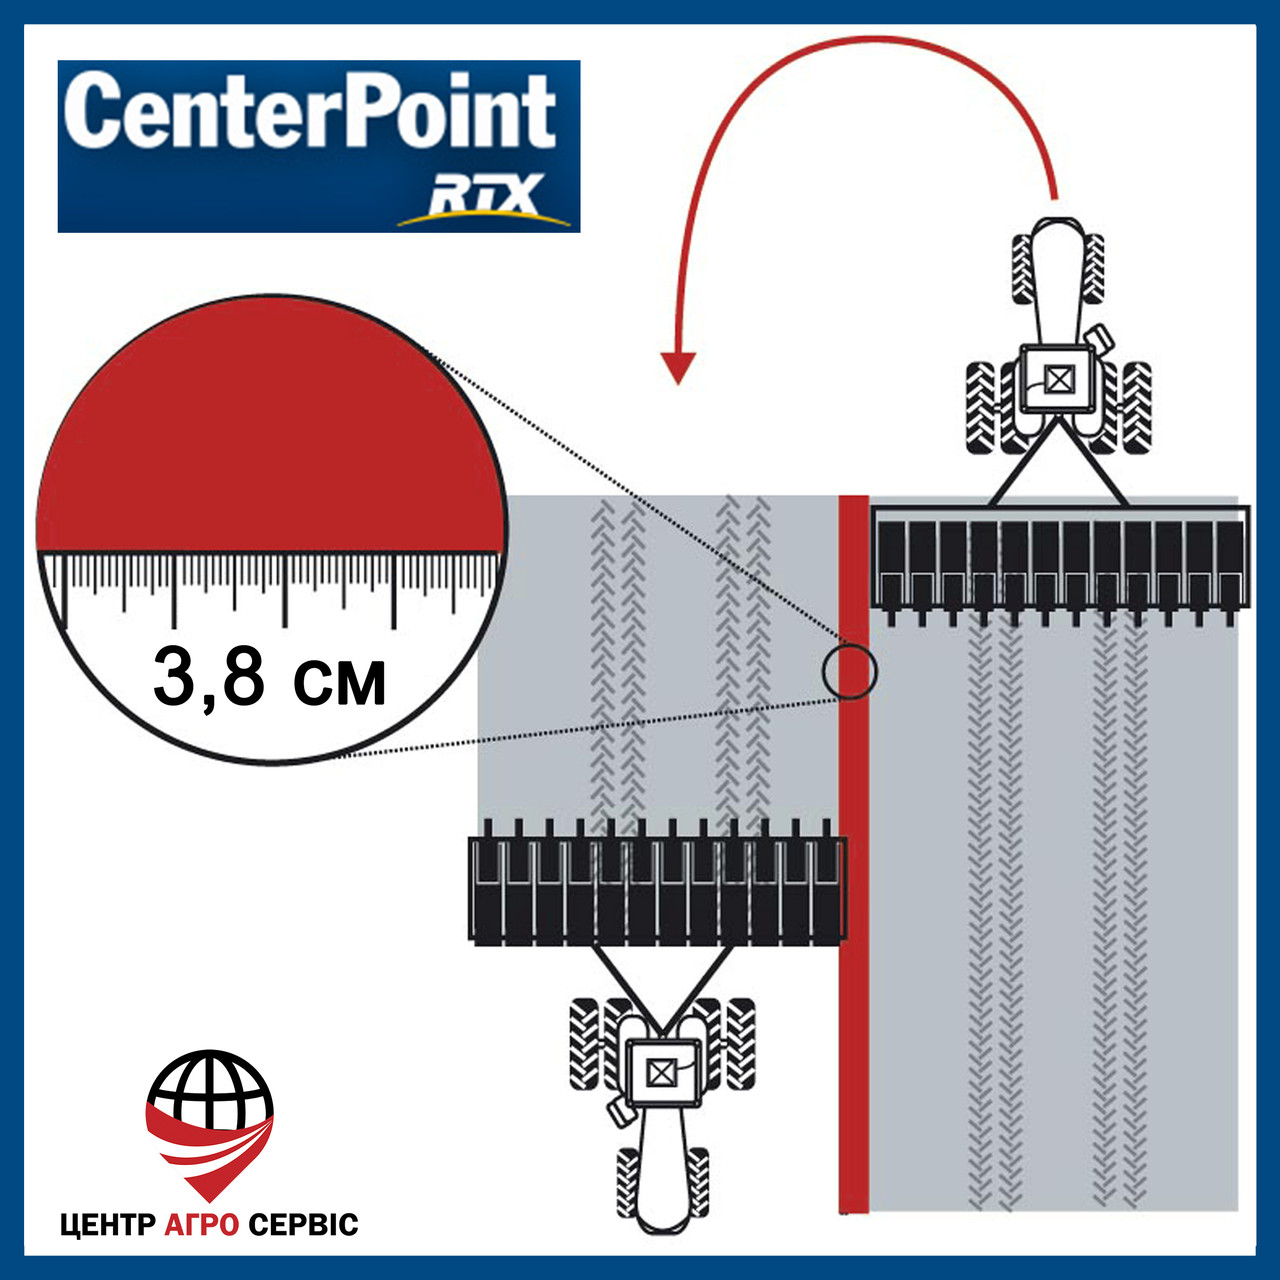 Спутниковая коррекция CenterPoint RTX Trimble (3,8 см) на 1 год